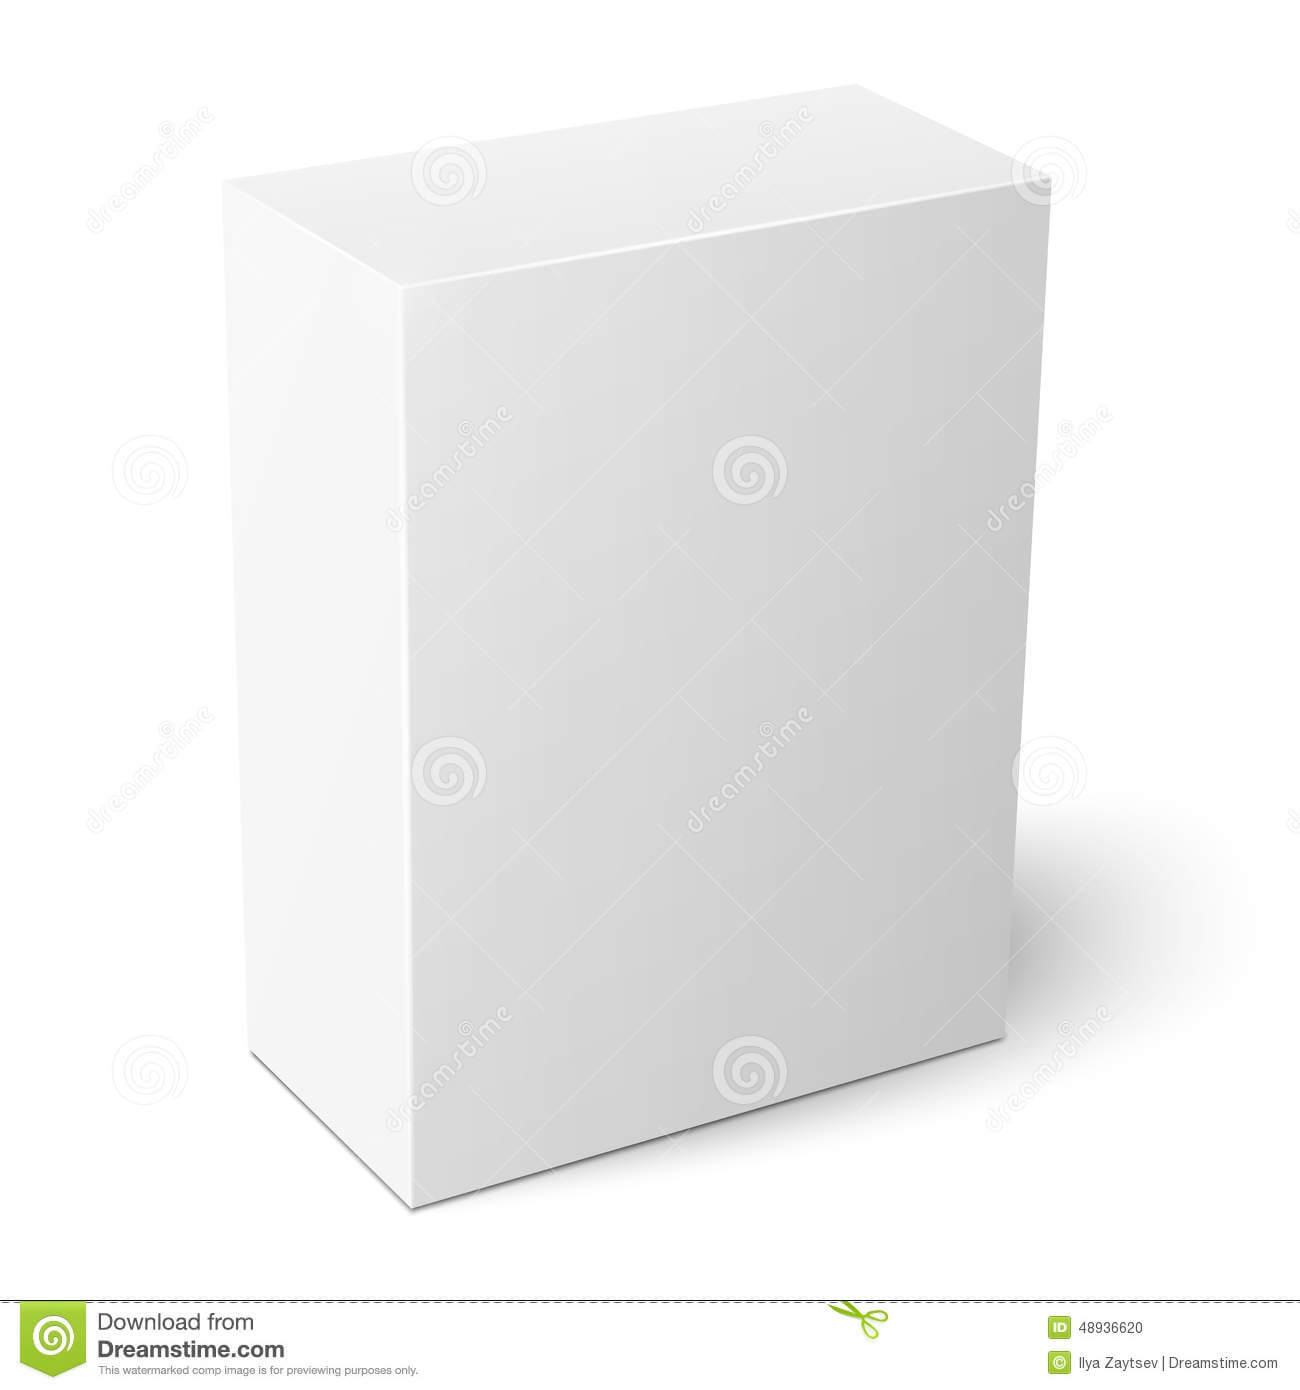 White Vertical Paper Box Template. Stock Vector Regarding Blank Packaging Templates